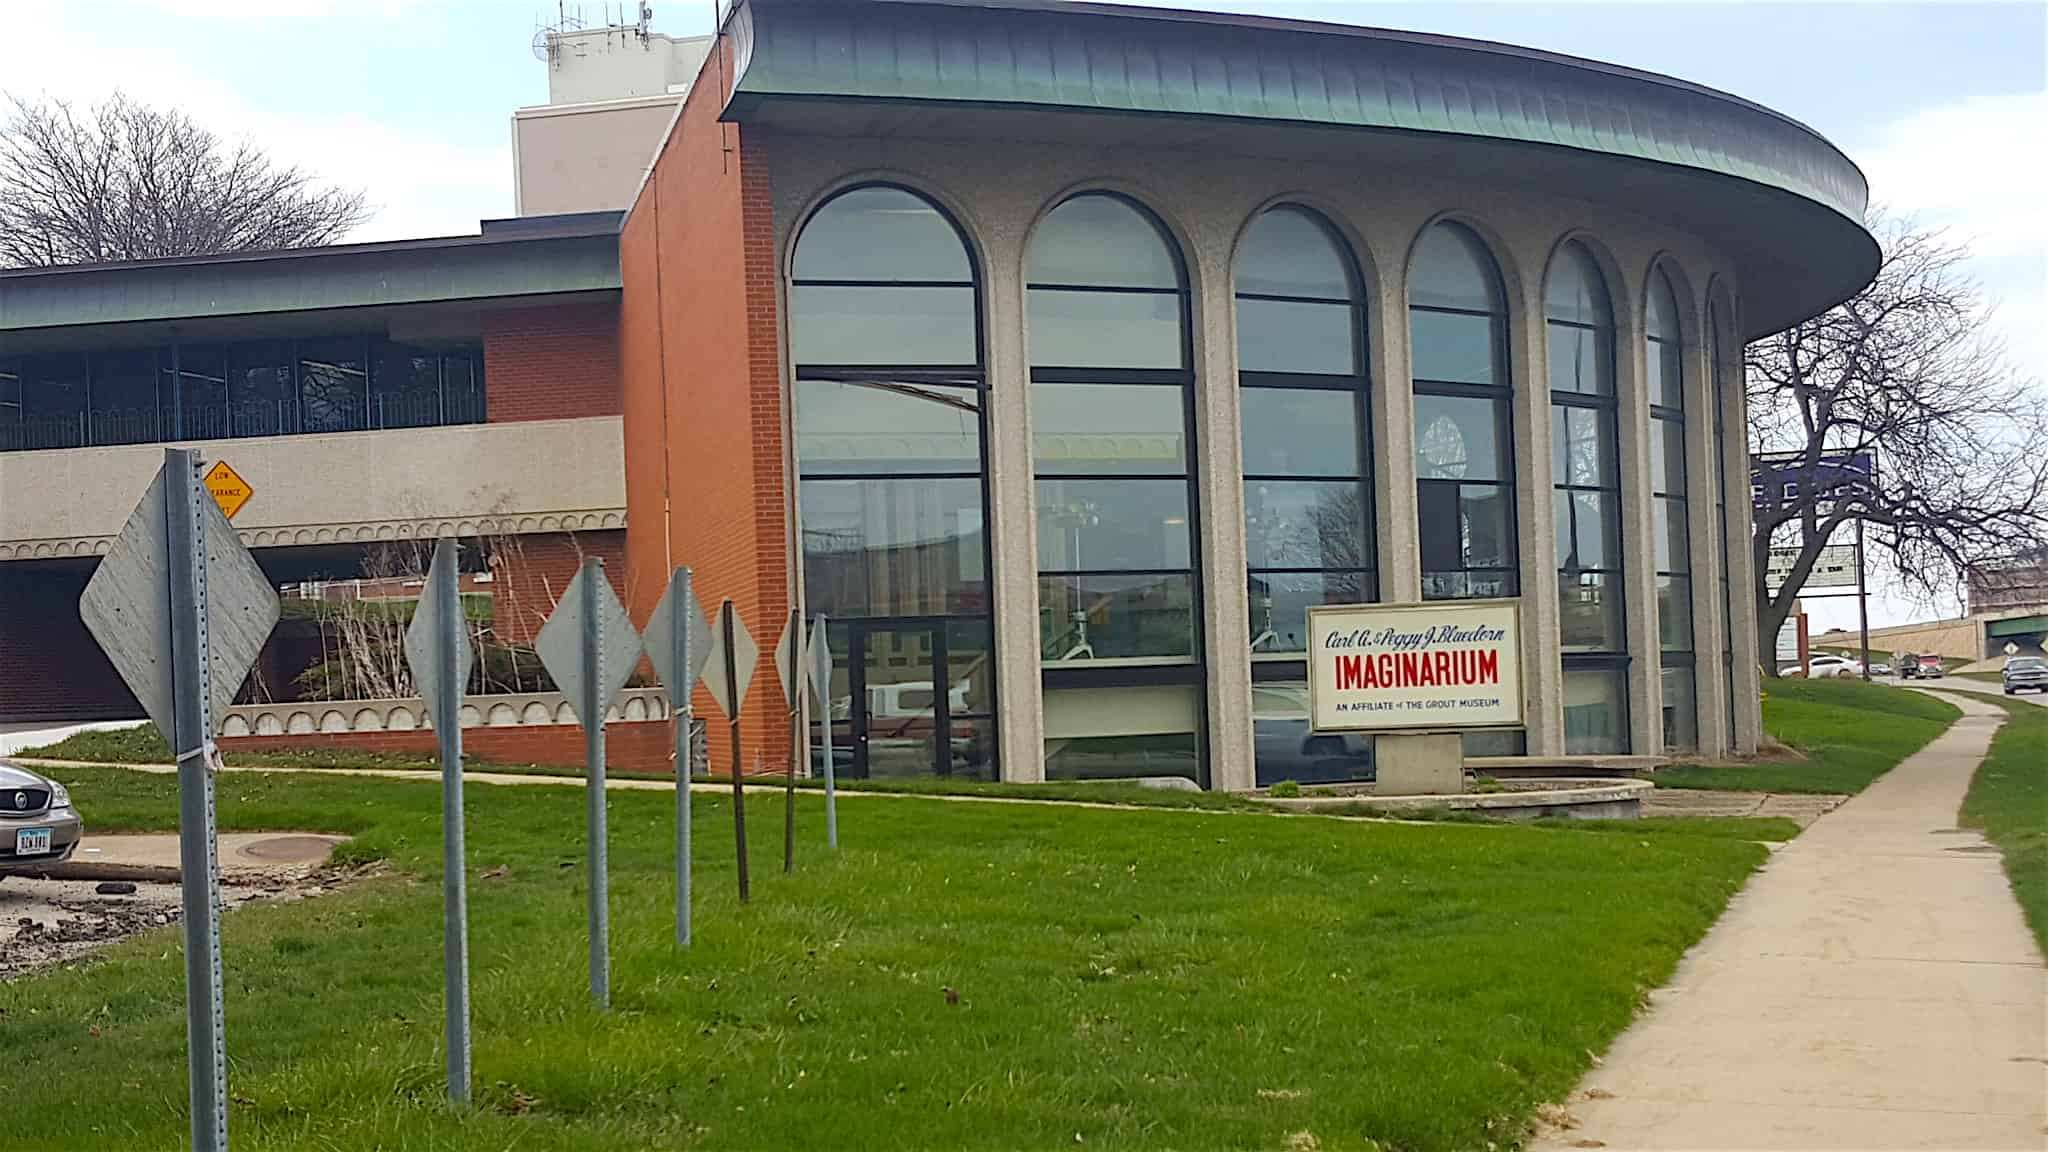 Waterloo Science Museum Imaginarium - BEST Places to Visit in Central East Iowa